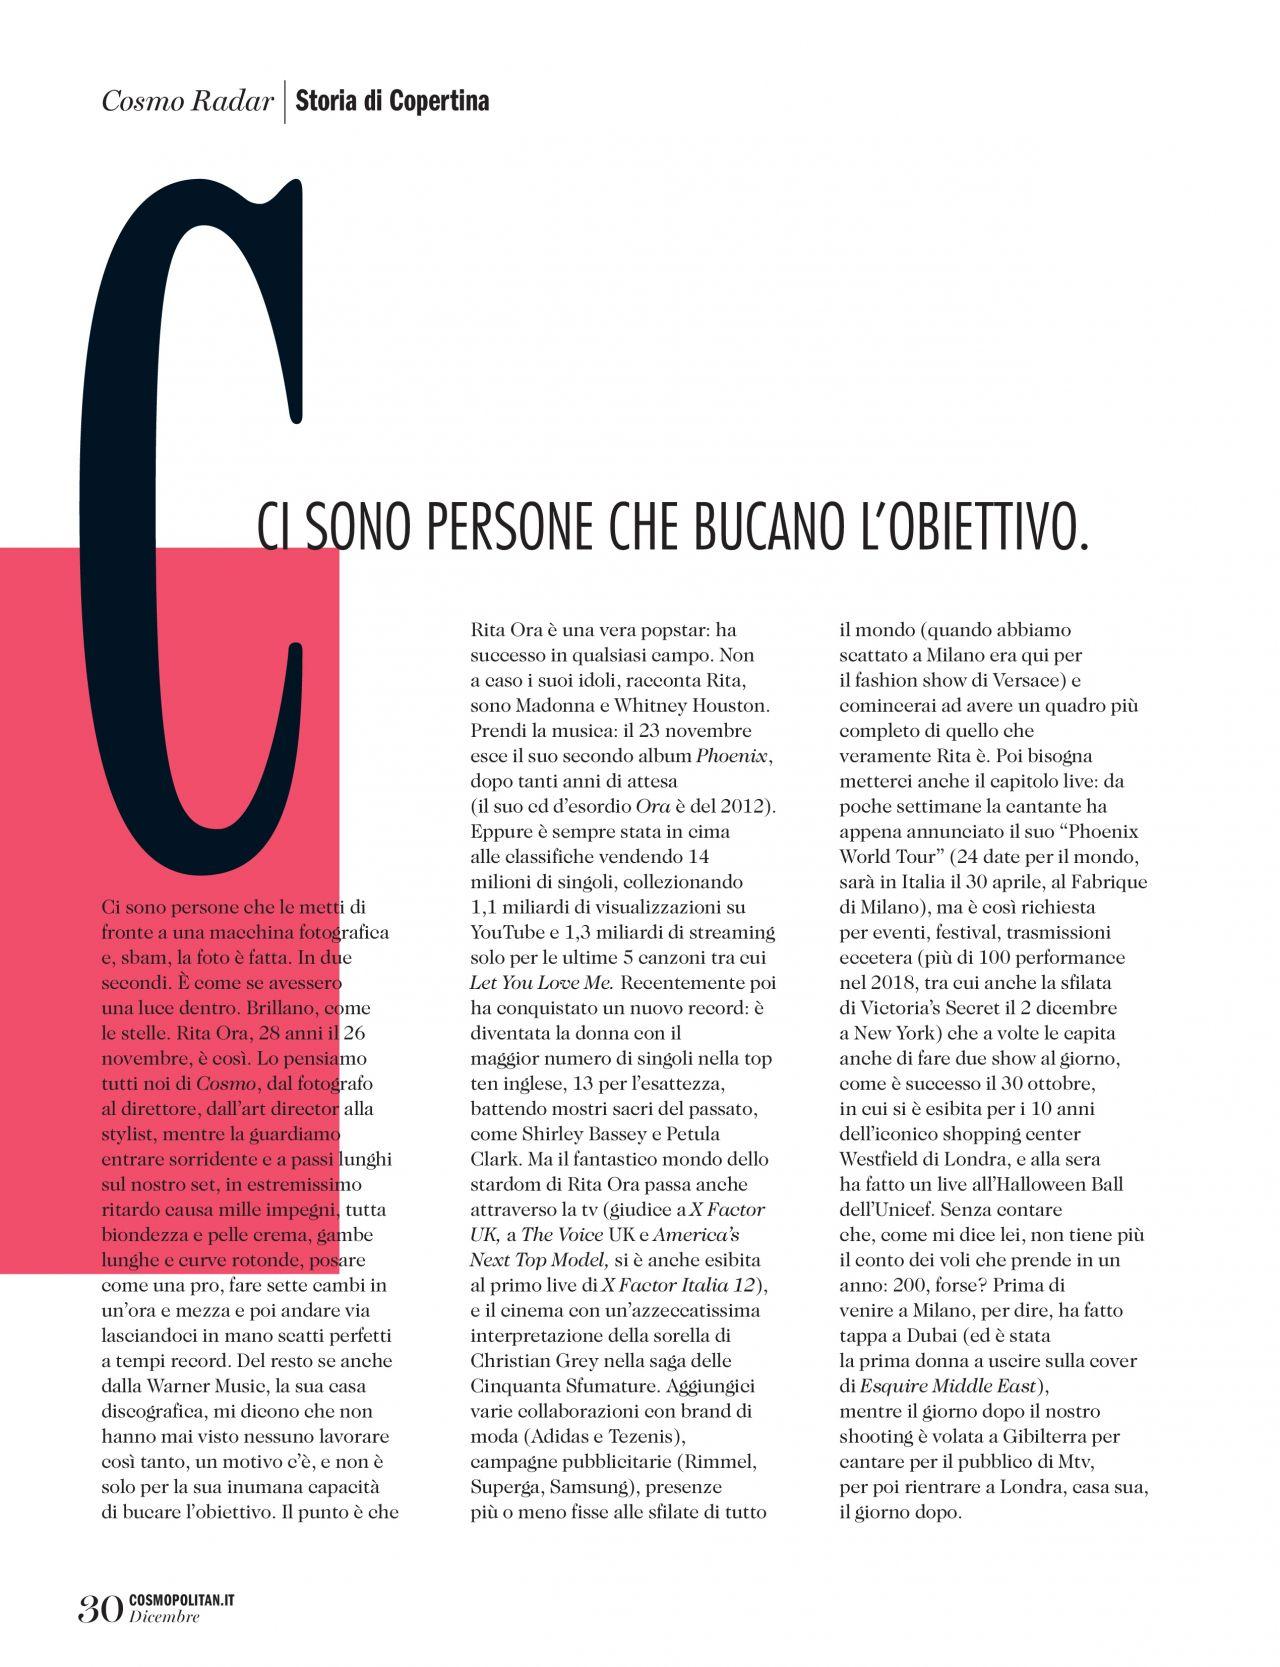 https://celebmafia.com/wp-content/uploads/2018/11/rita-ora-cosmopolitan-italy-december-2018-issue-4.jpg